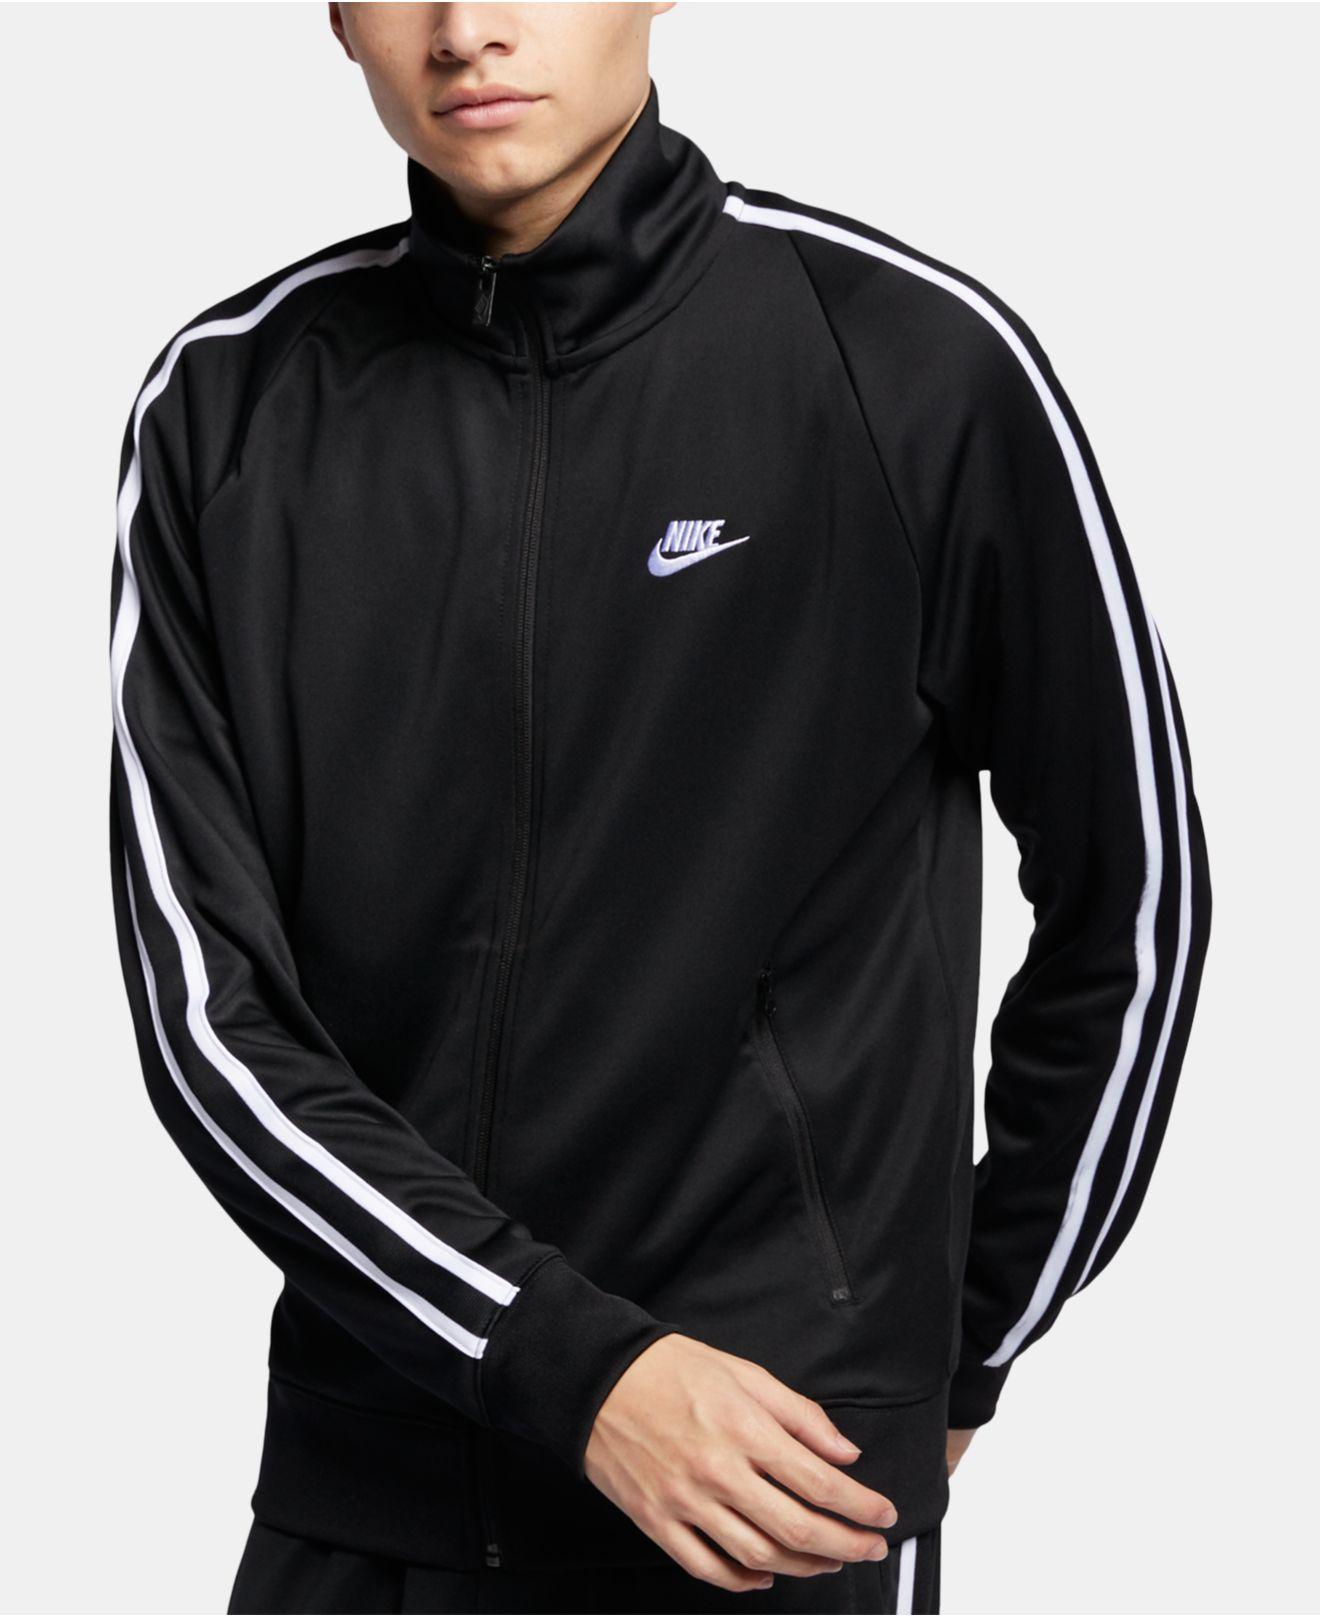 Nike - Black Sportswear Track Jacket for Men - Lyst. View fullscreen c3c35b1a5